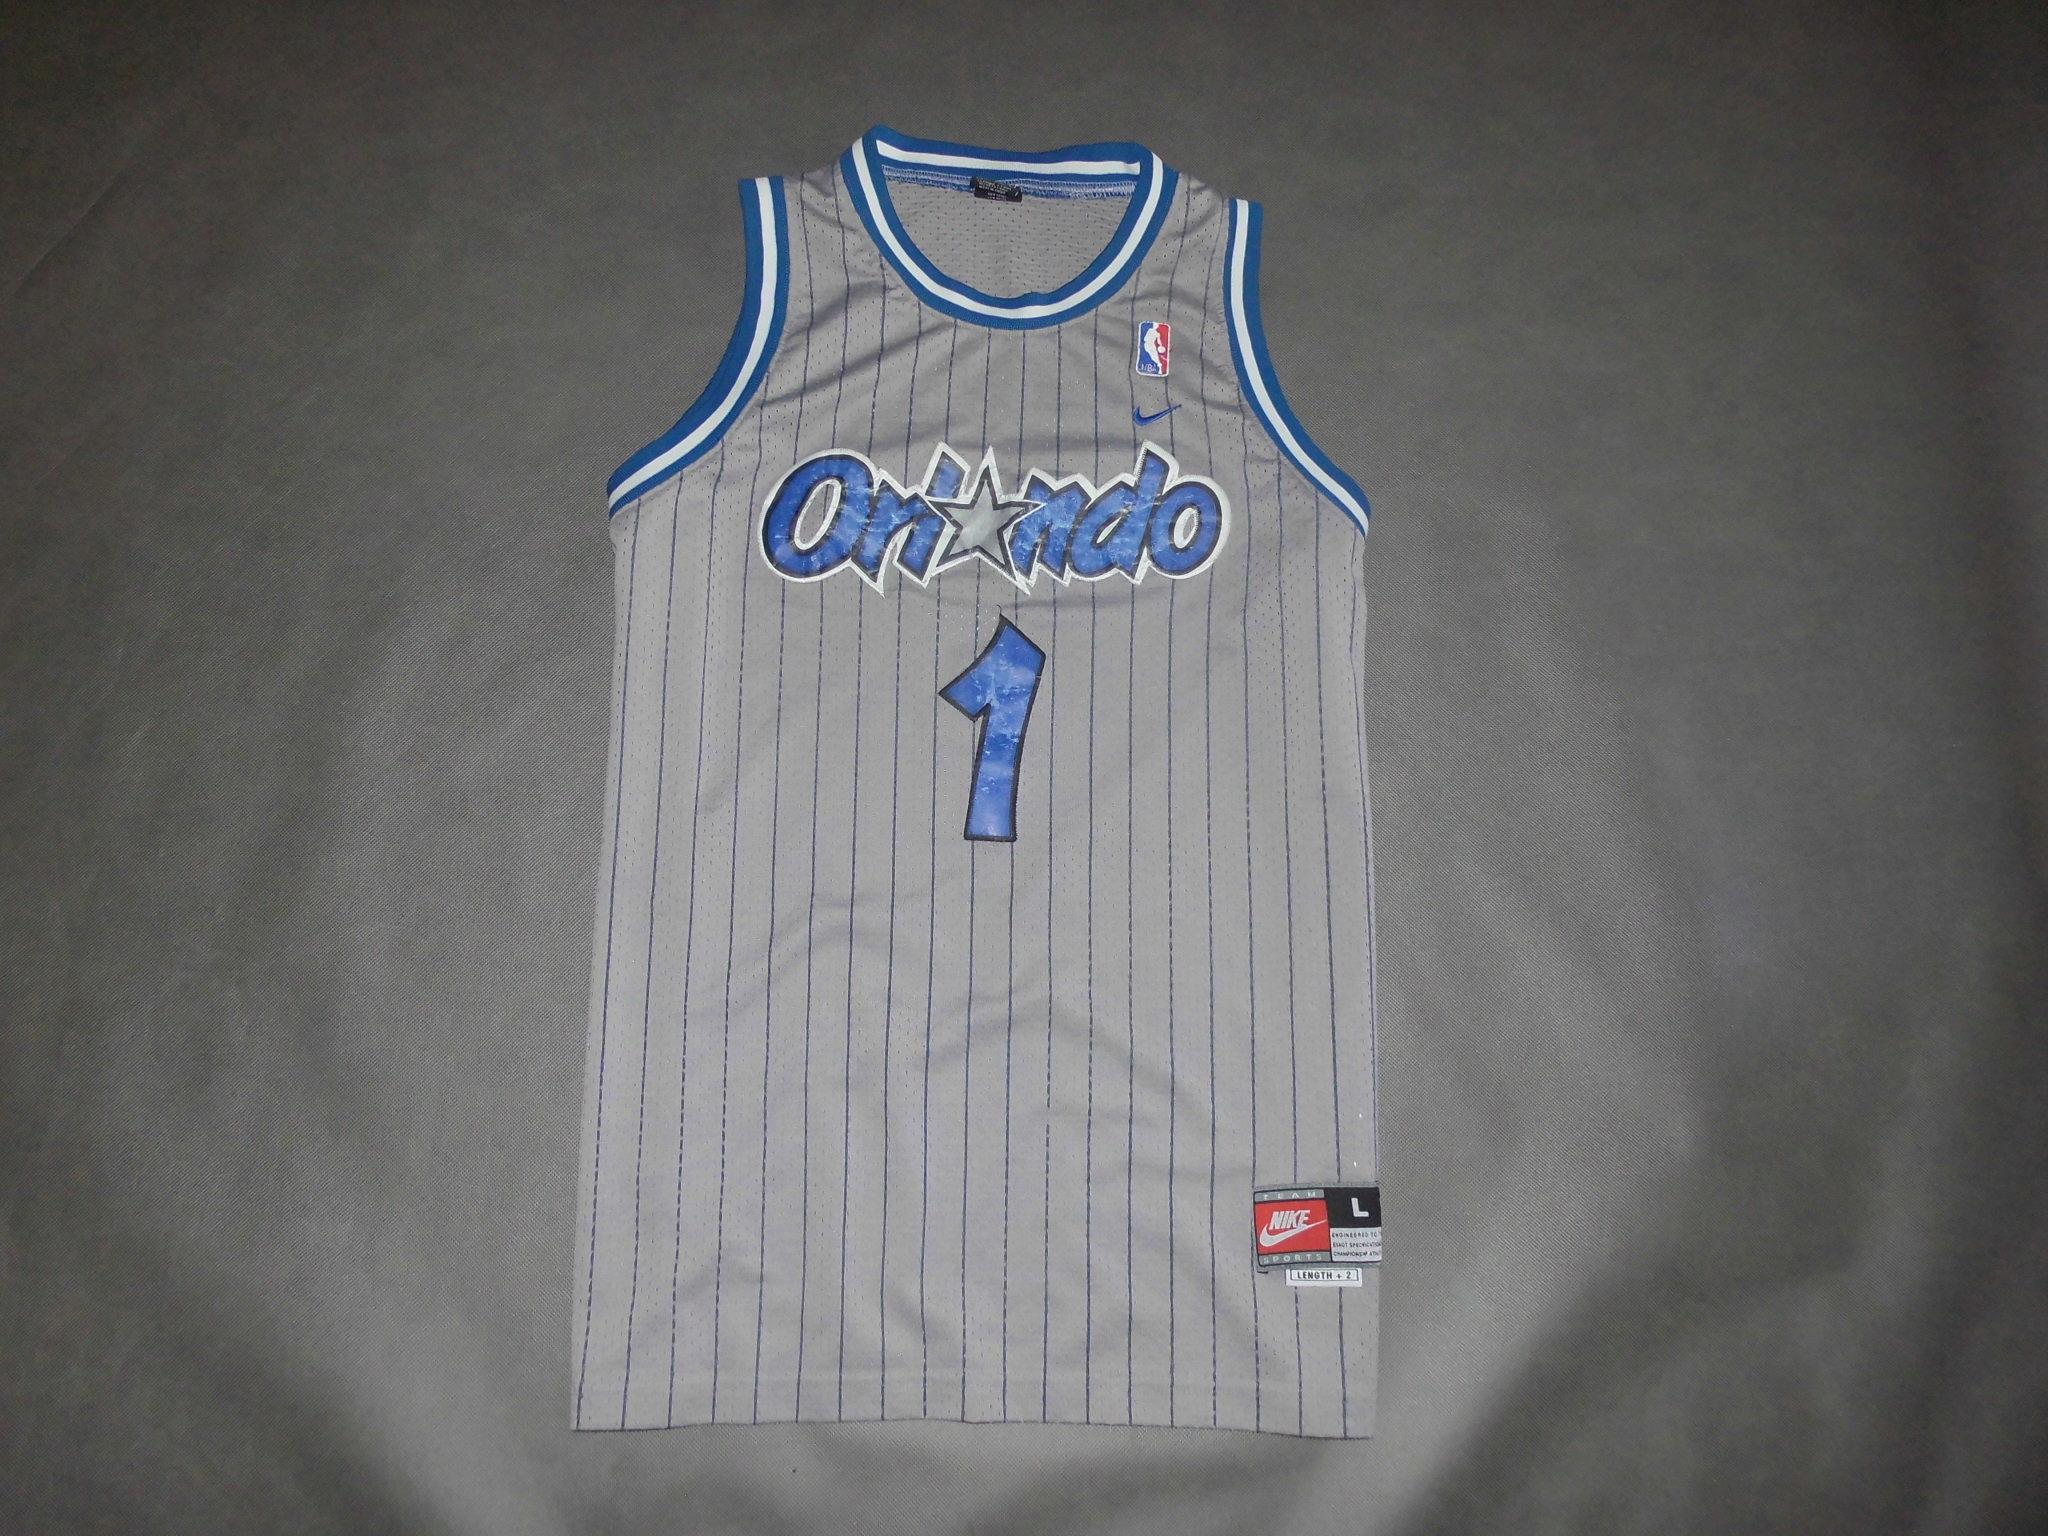 NBA_ORLANDO MAGIC_McGRADY NR.1_NIKE_L_1995